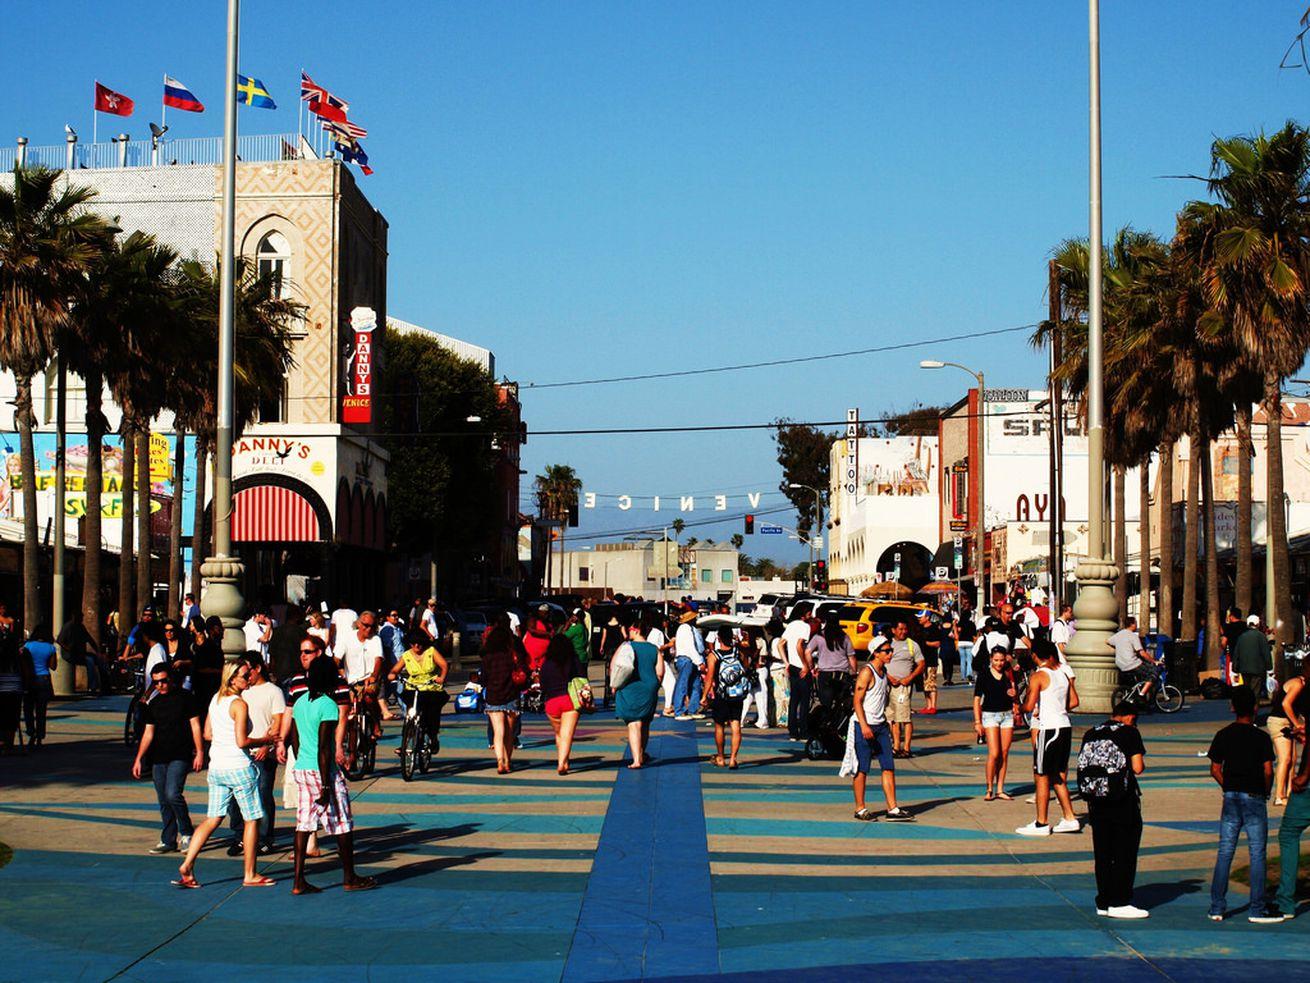 A crowded scene in Venice